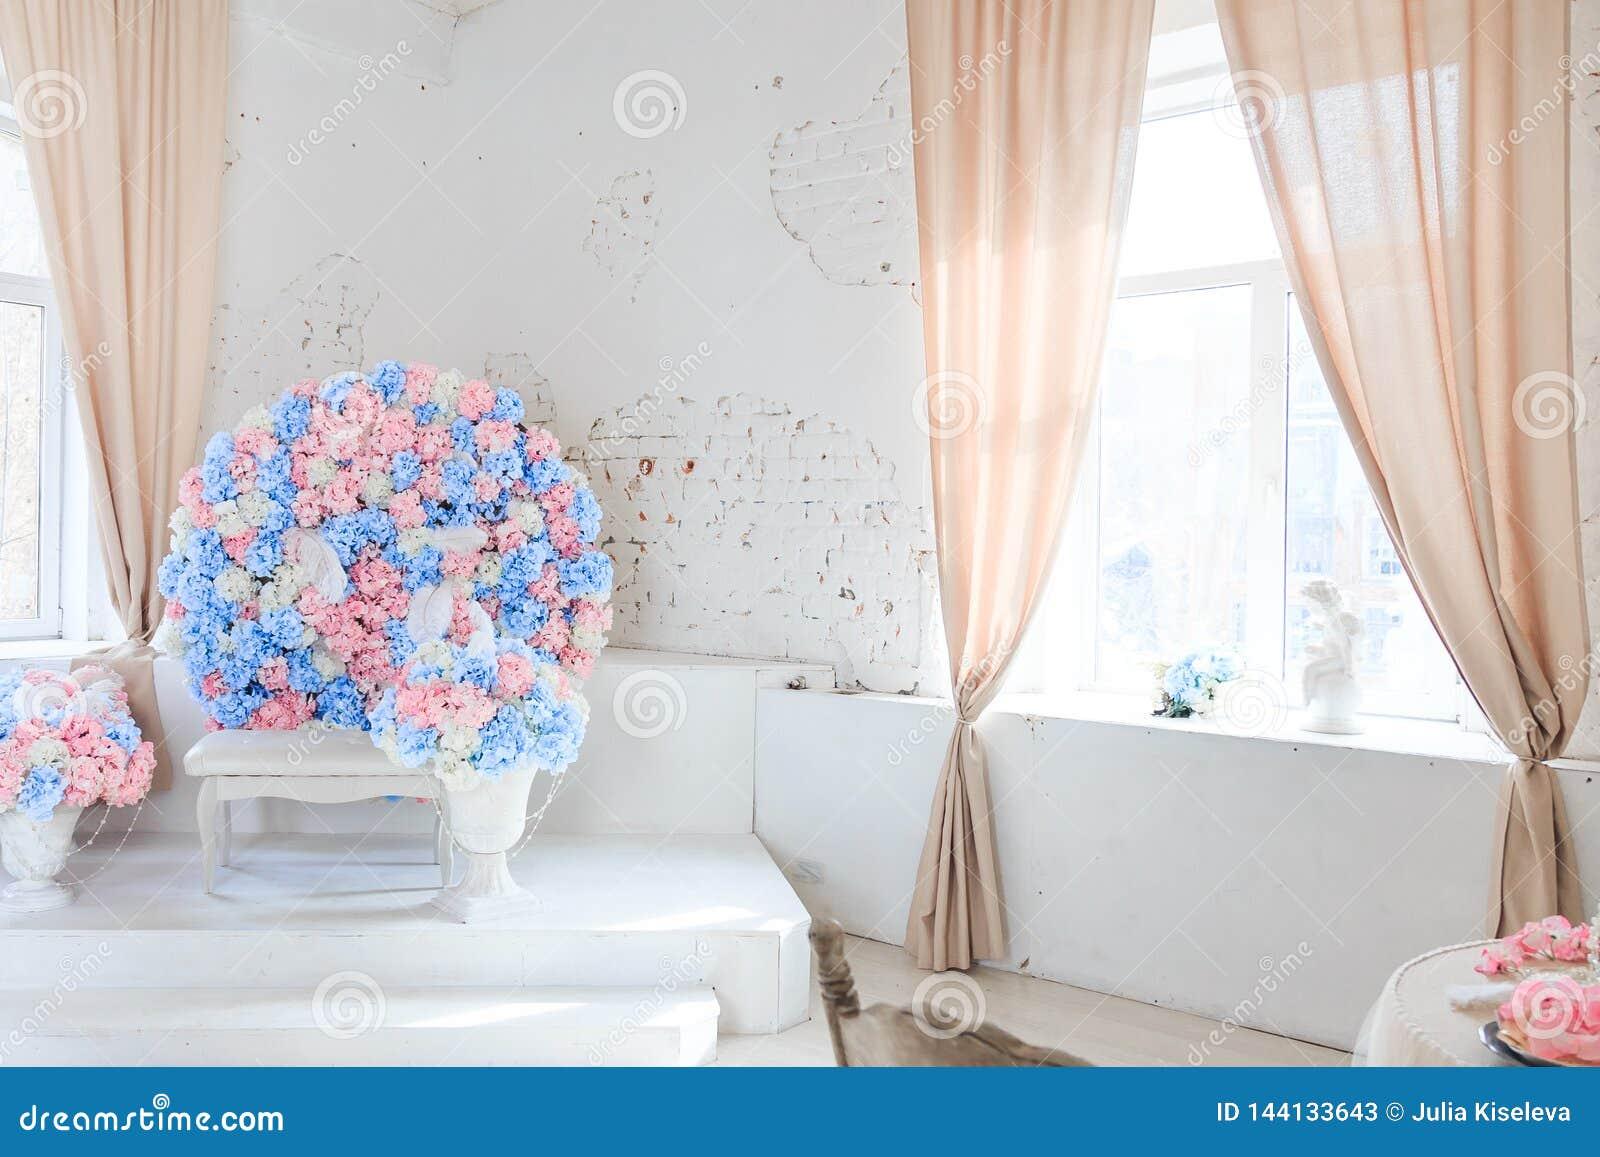 Making flowers spacious bright room.